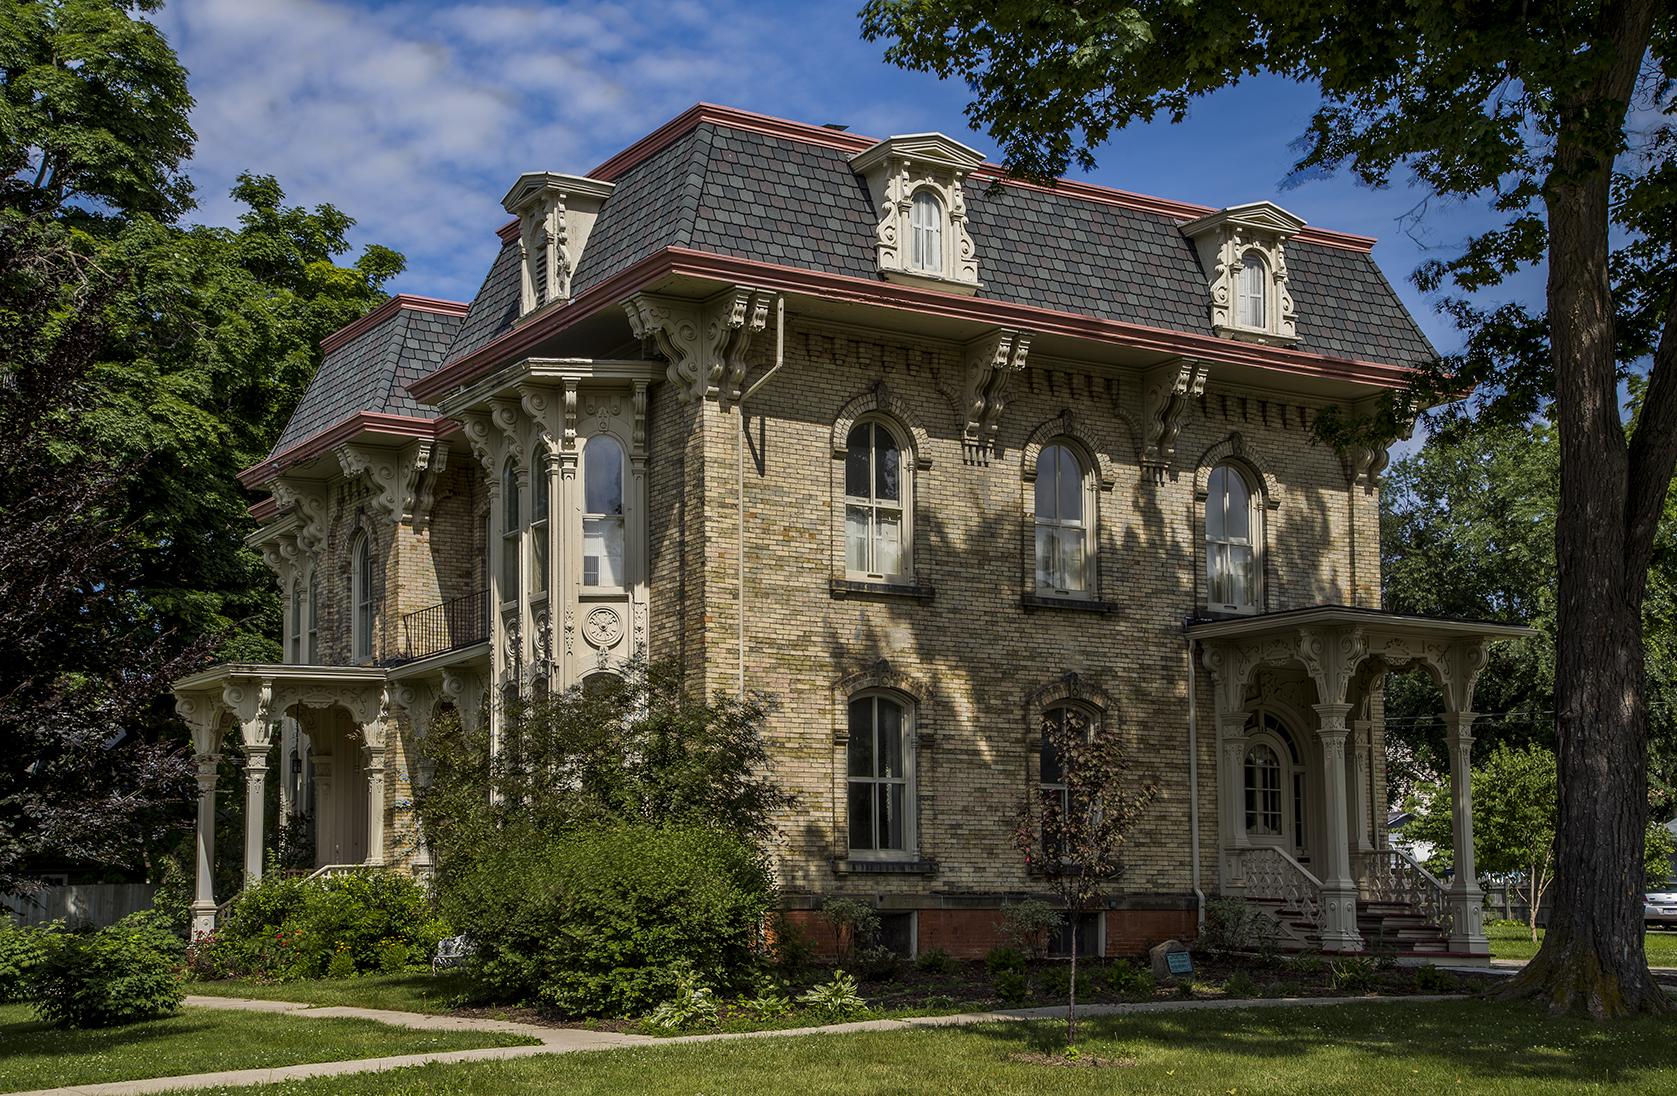 1 House 6 (front shot) 2.jpg